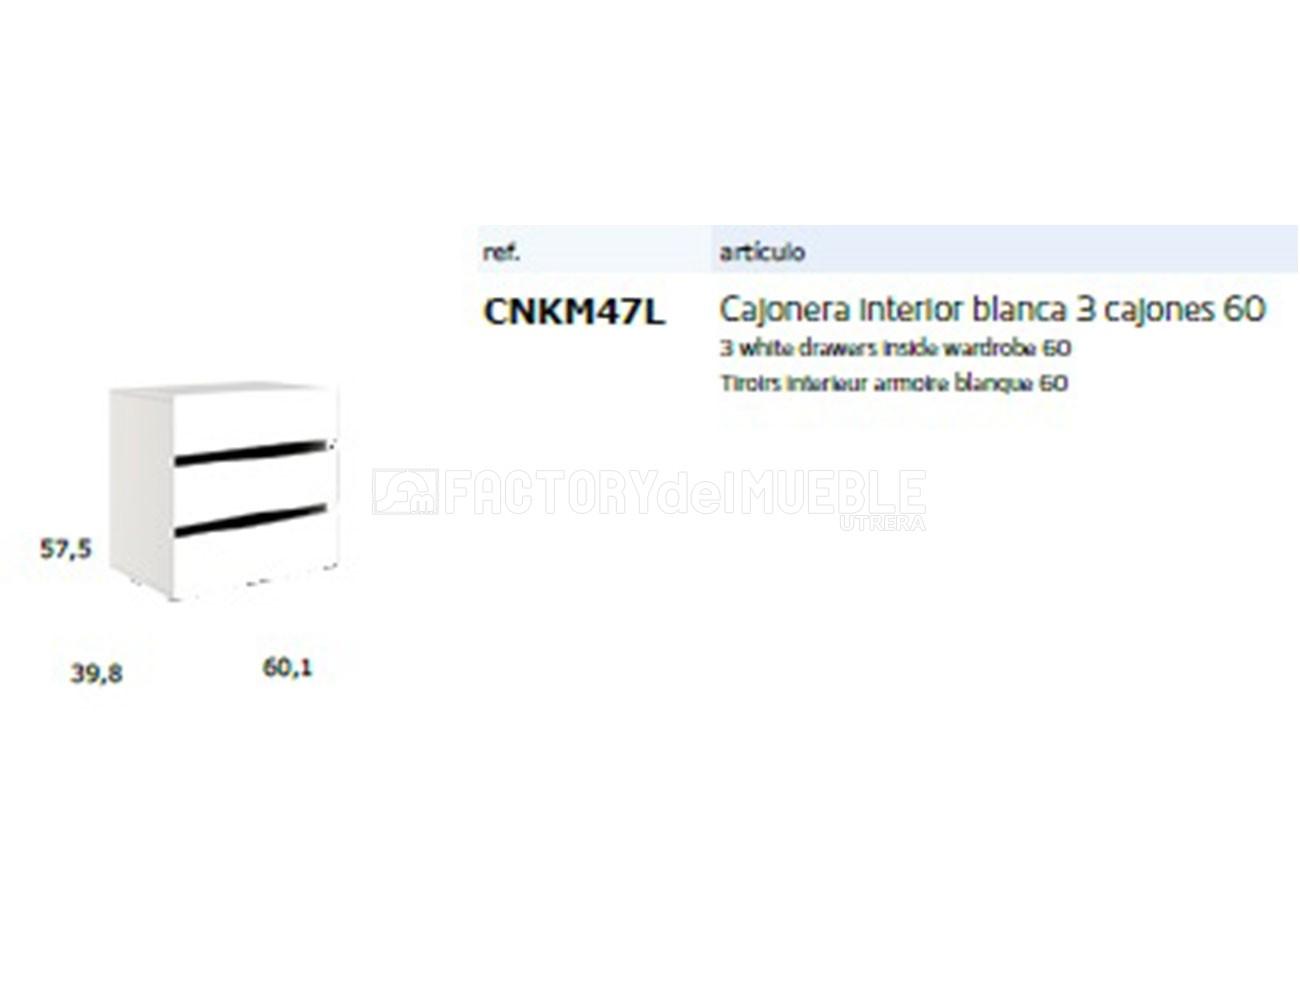 Cnkm47l cajonera interior blanca 3 cajones60